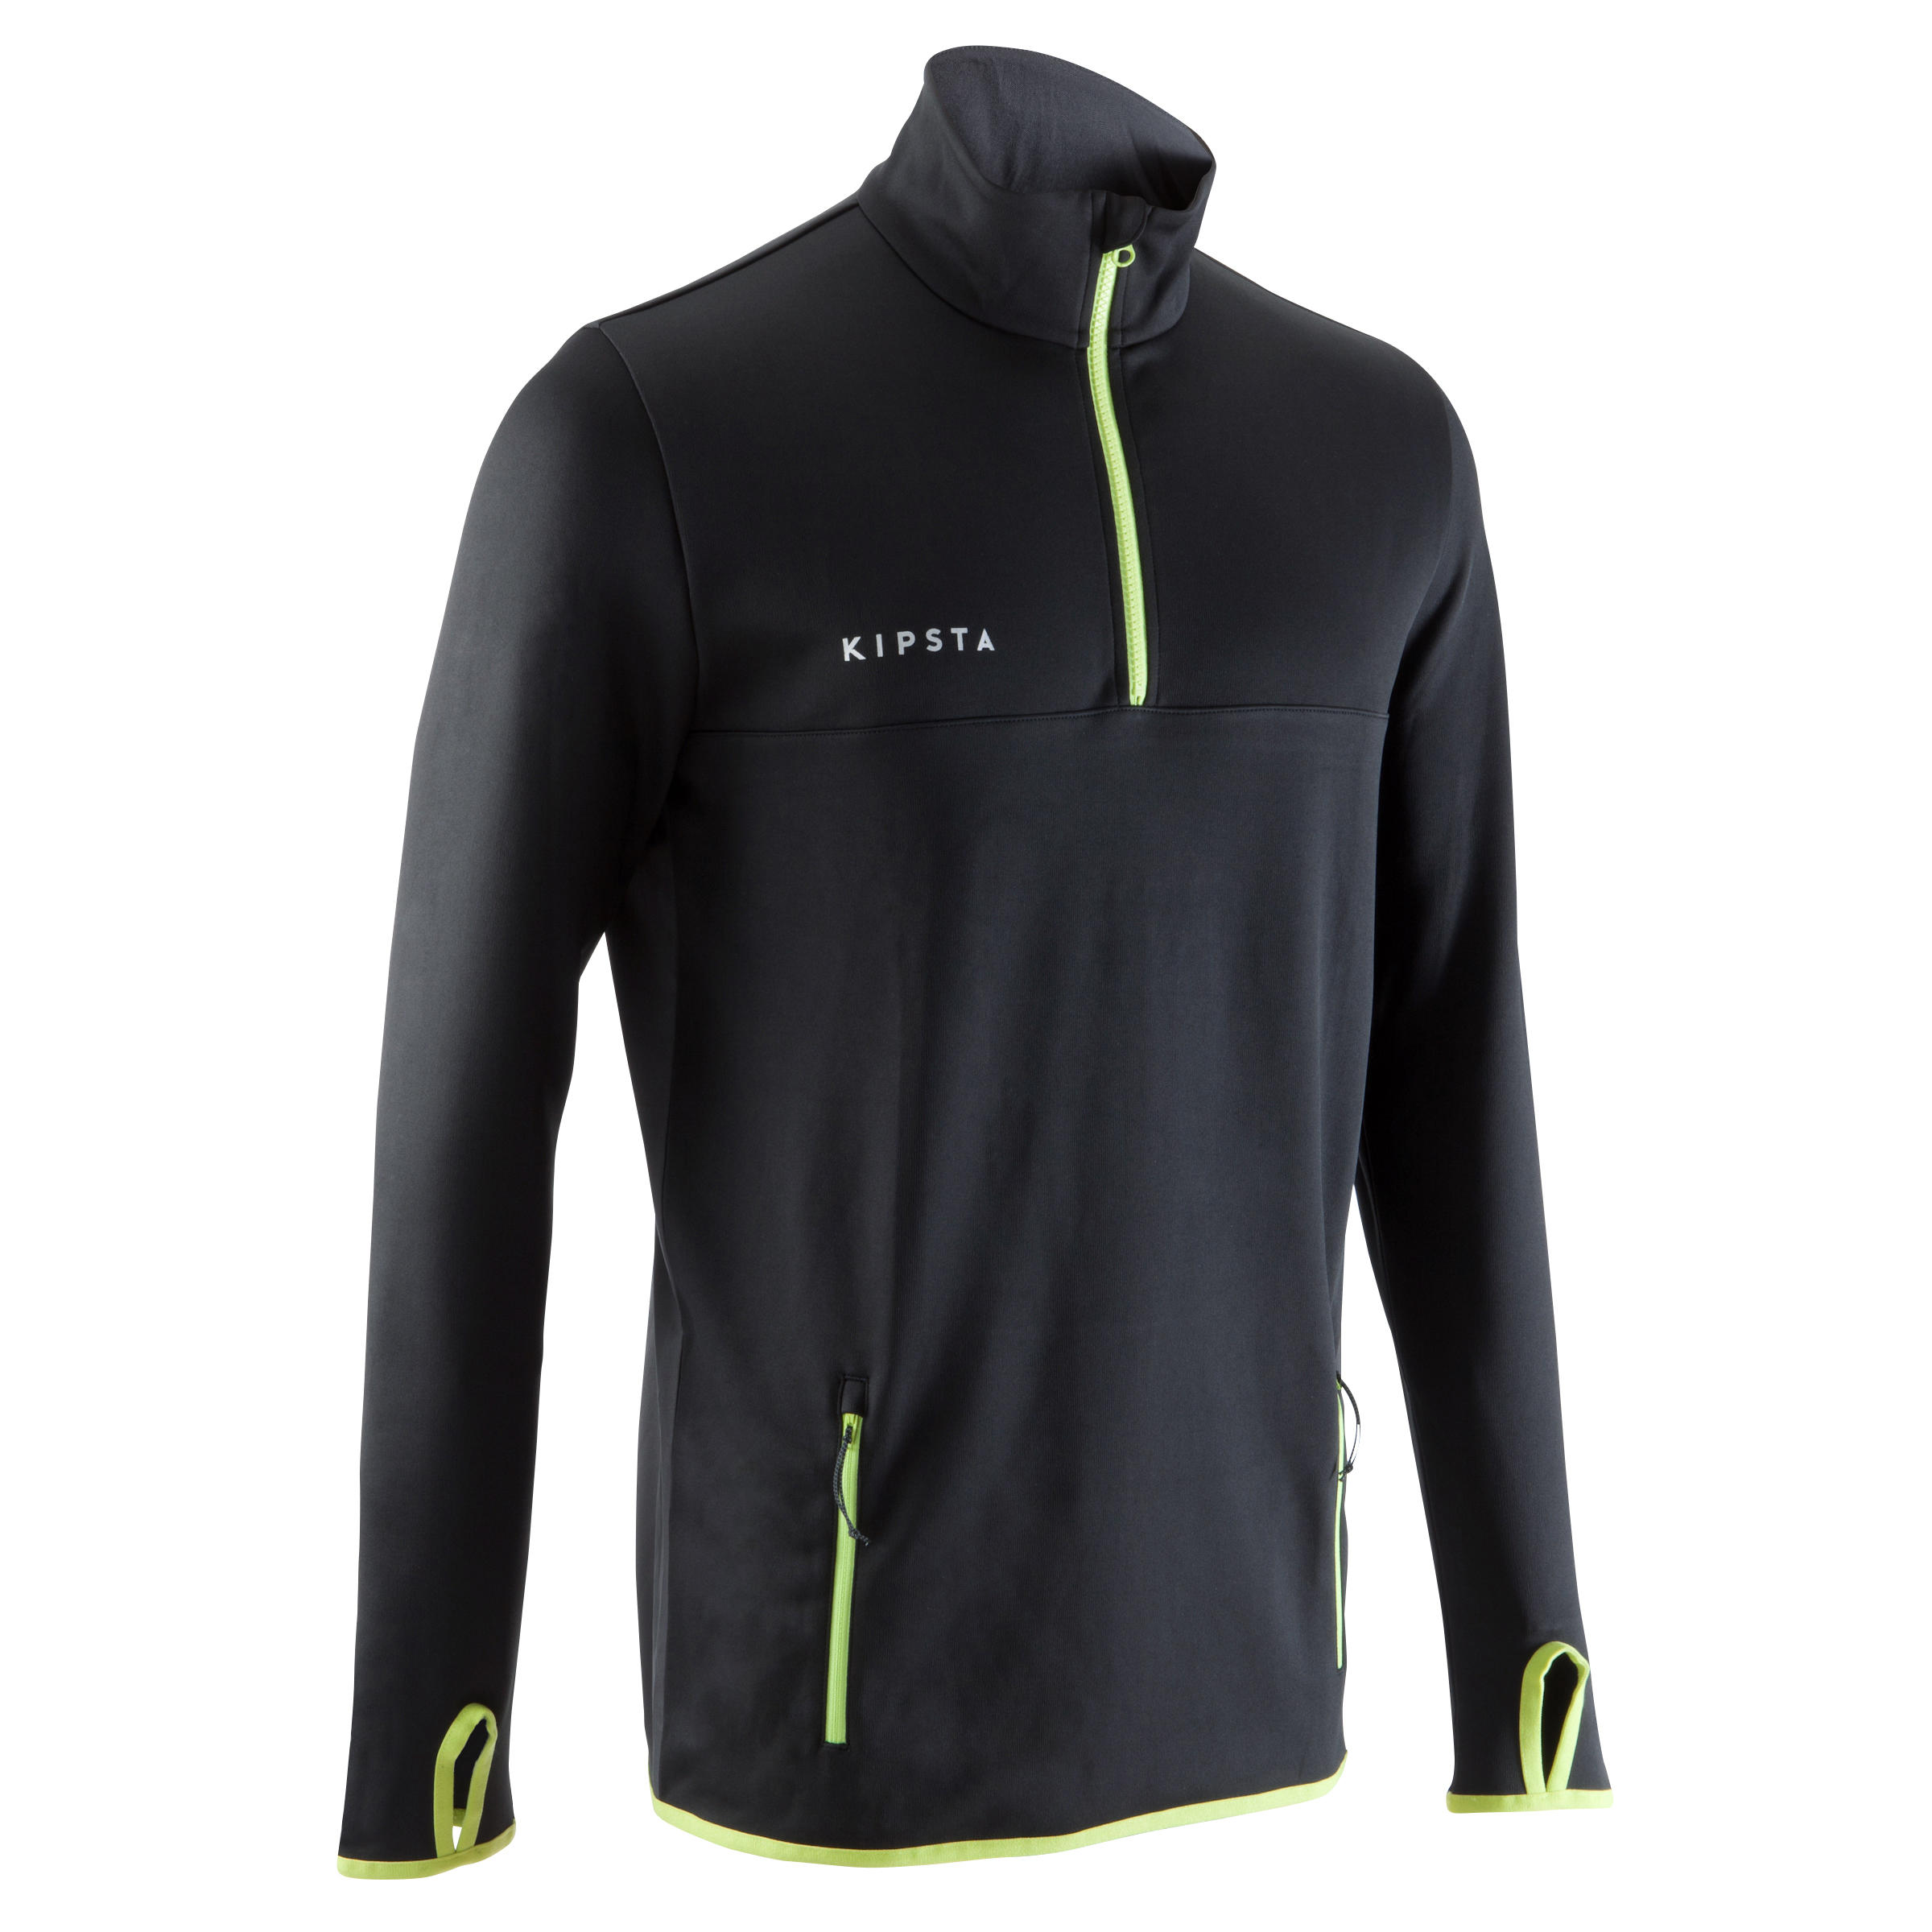 T500 Adult Soccer Training Half-Zipper Sweatshirt - Black